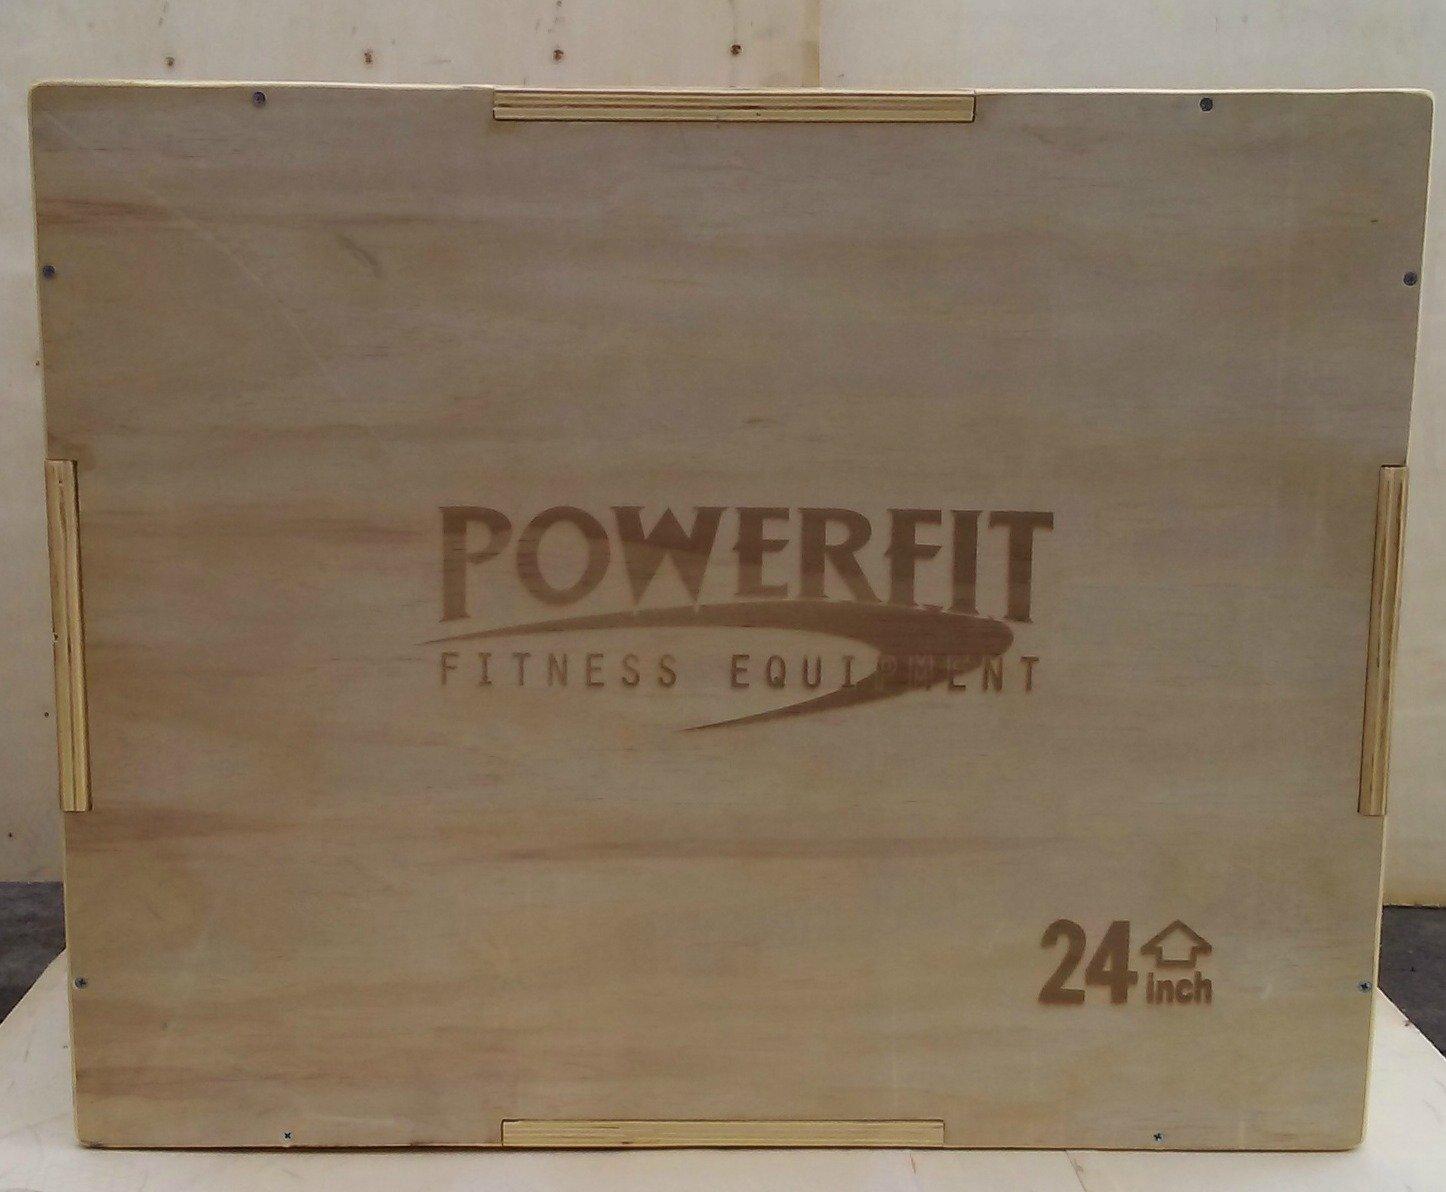 PowerFit 20''/24''/30'' Wooden Plyo Box